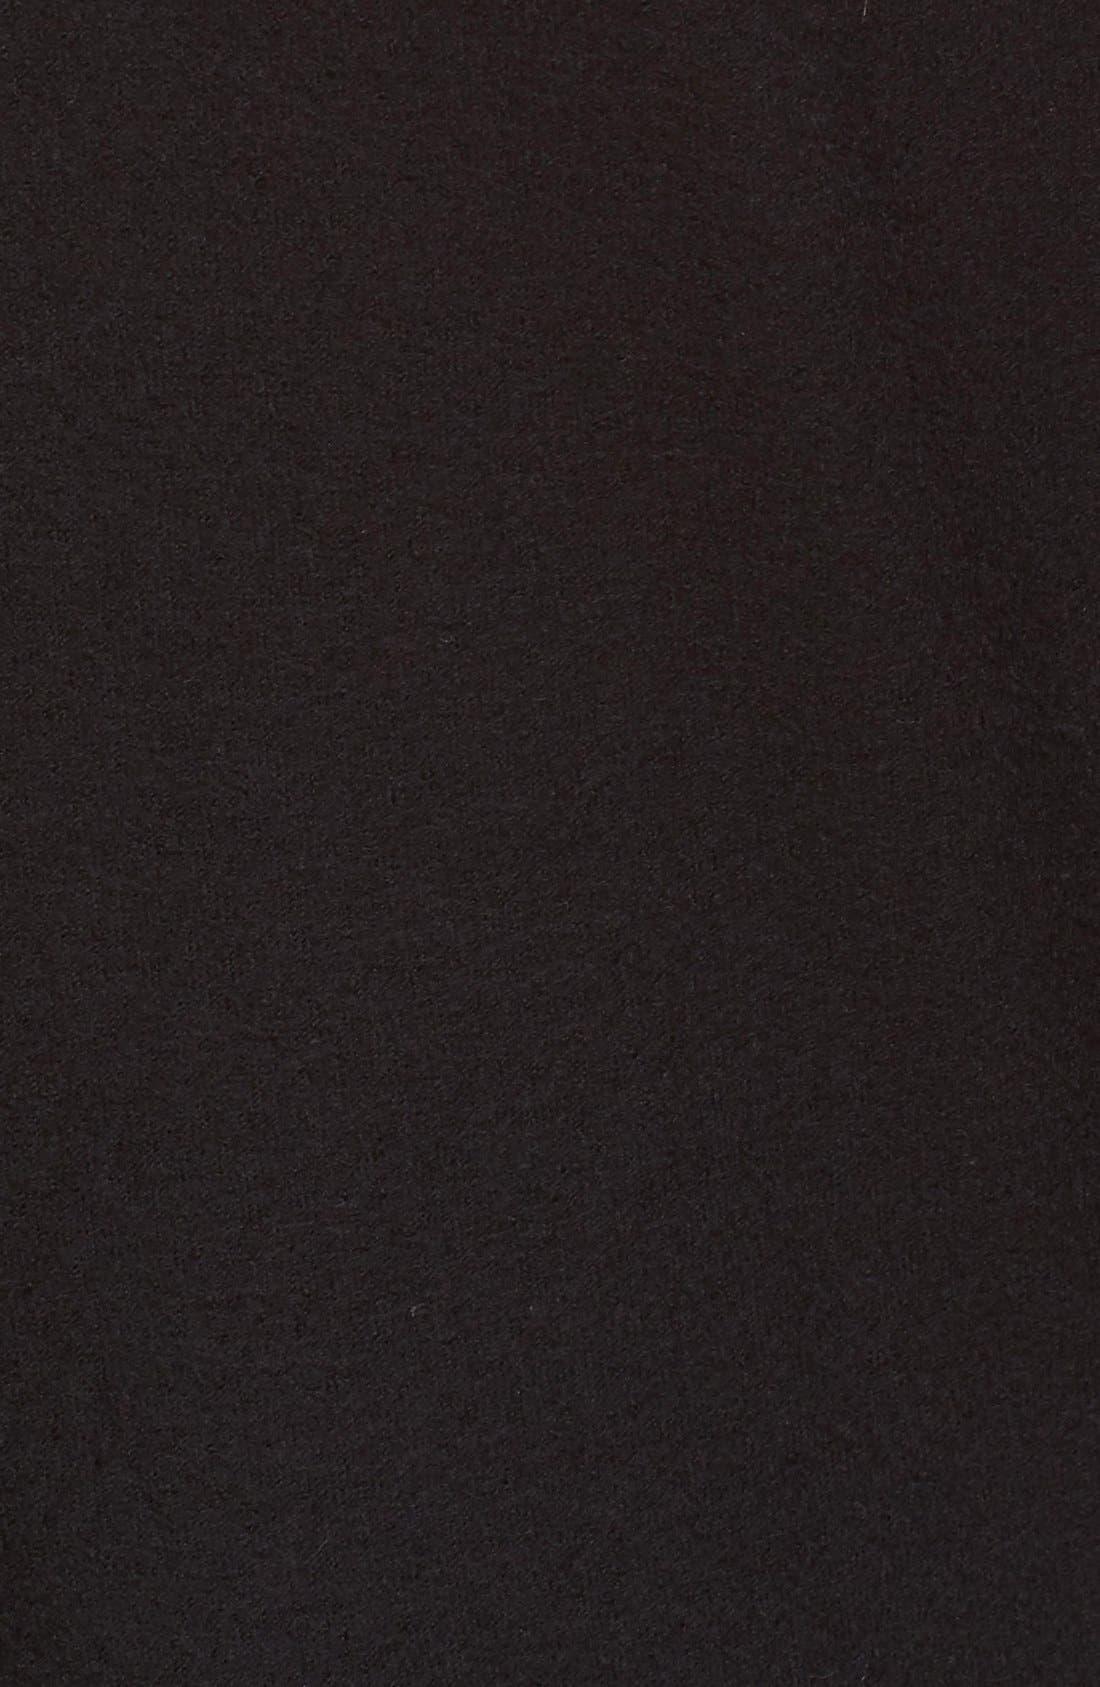 Club Wool Blazer,                             Alternate thumbnail 2, color,                             BLACK